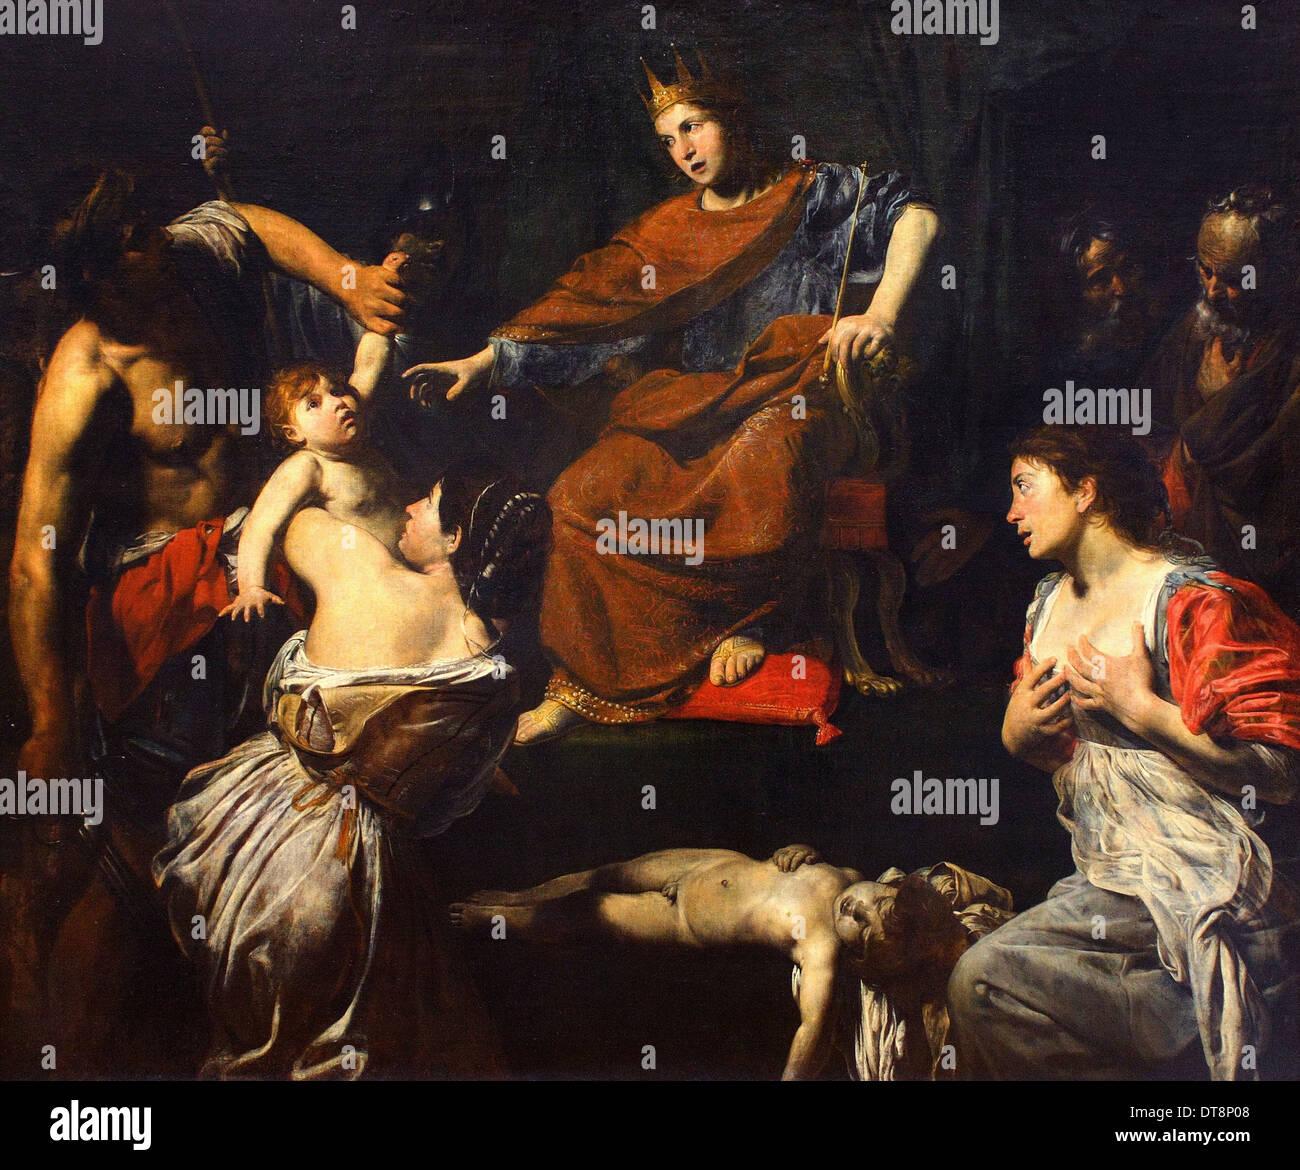 Valentin de Boulogne aka The Valentin - The Judgment of Solomon - circa 1625 - Louvre Museum - Paris - Stock Image